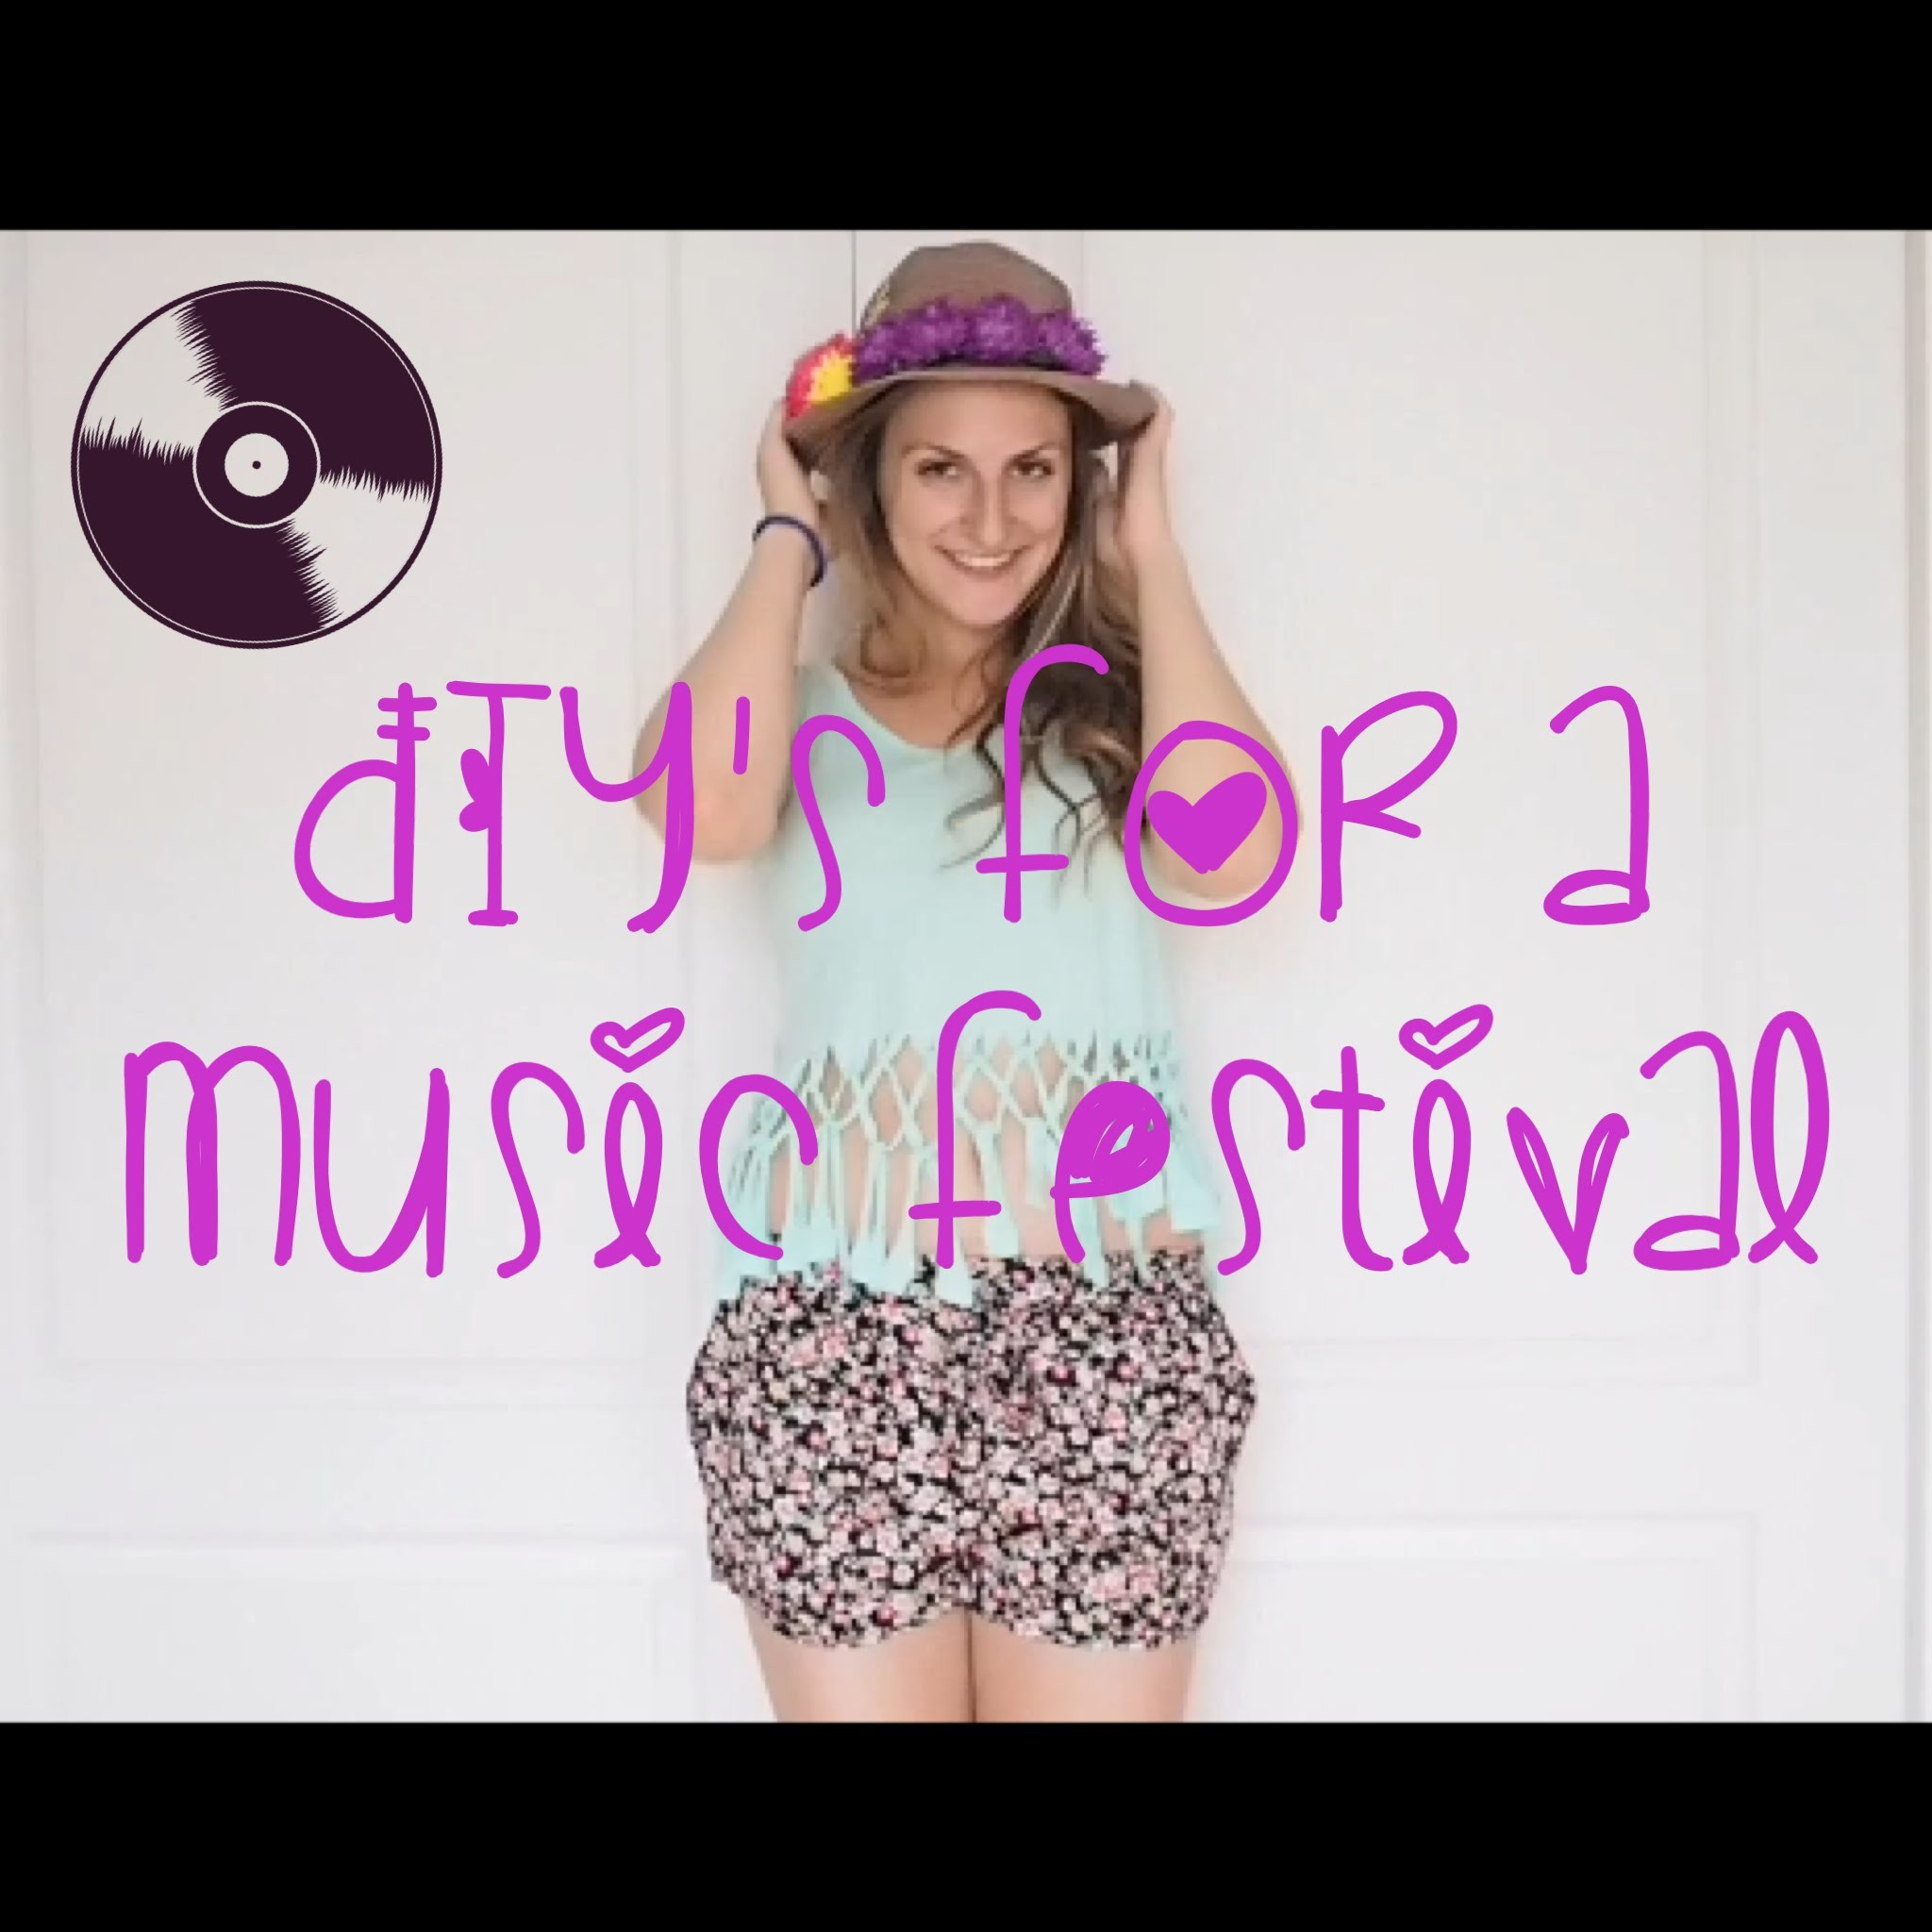 DIY's for a music festival